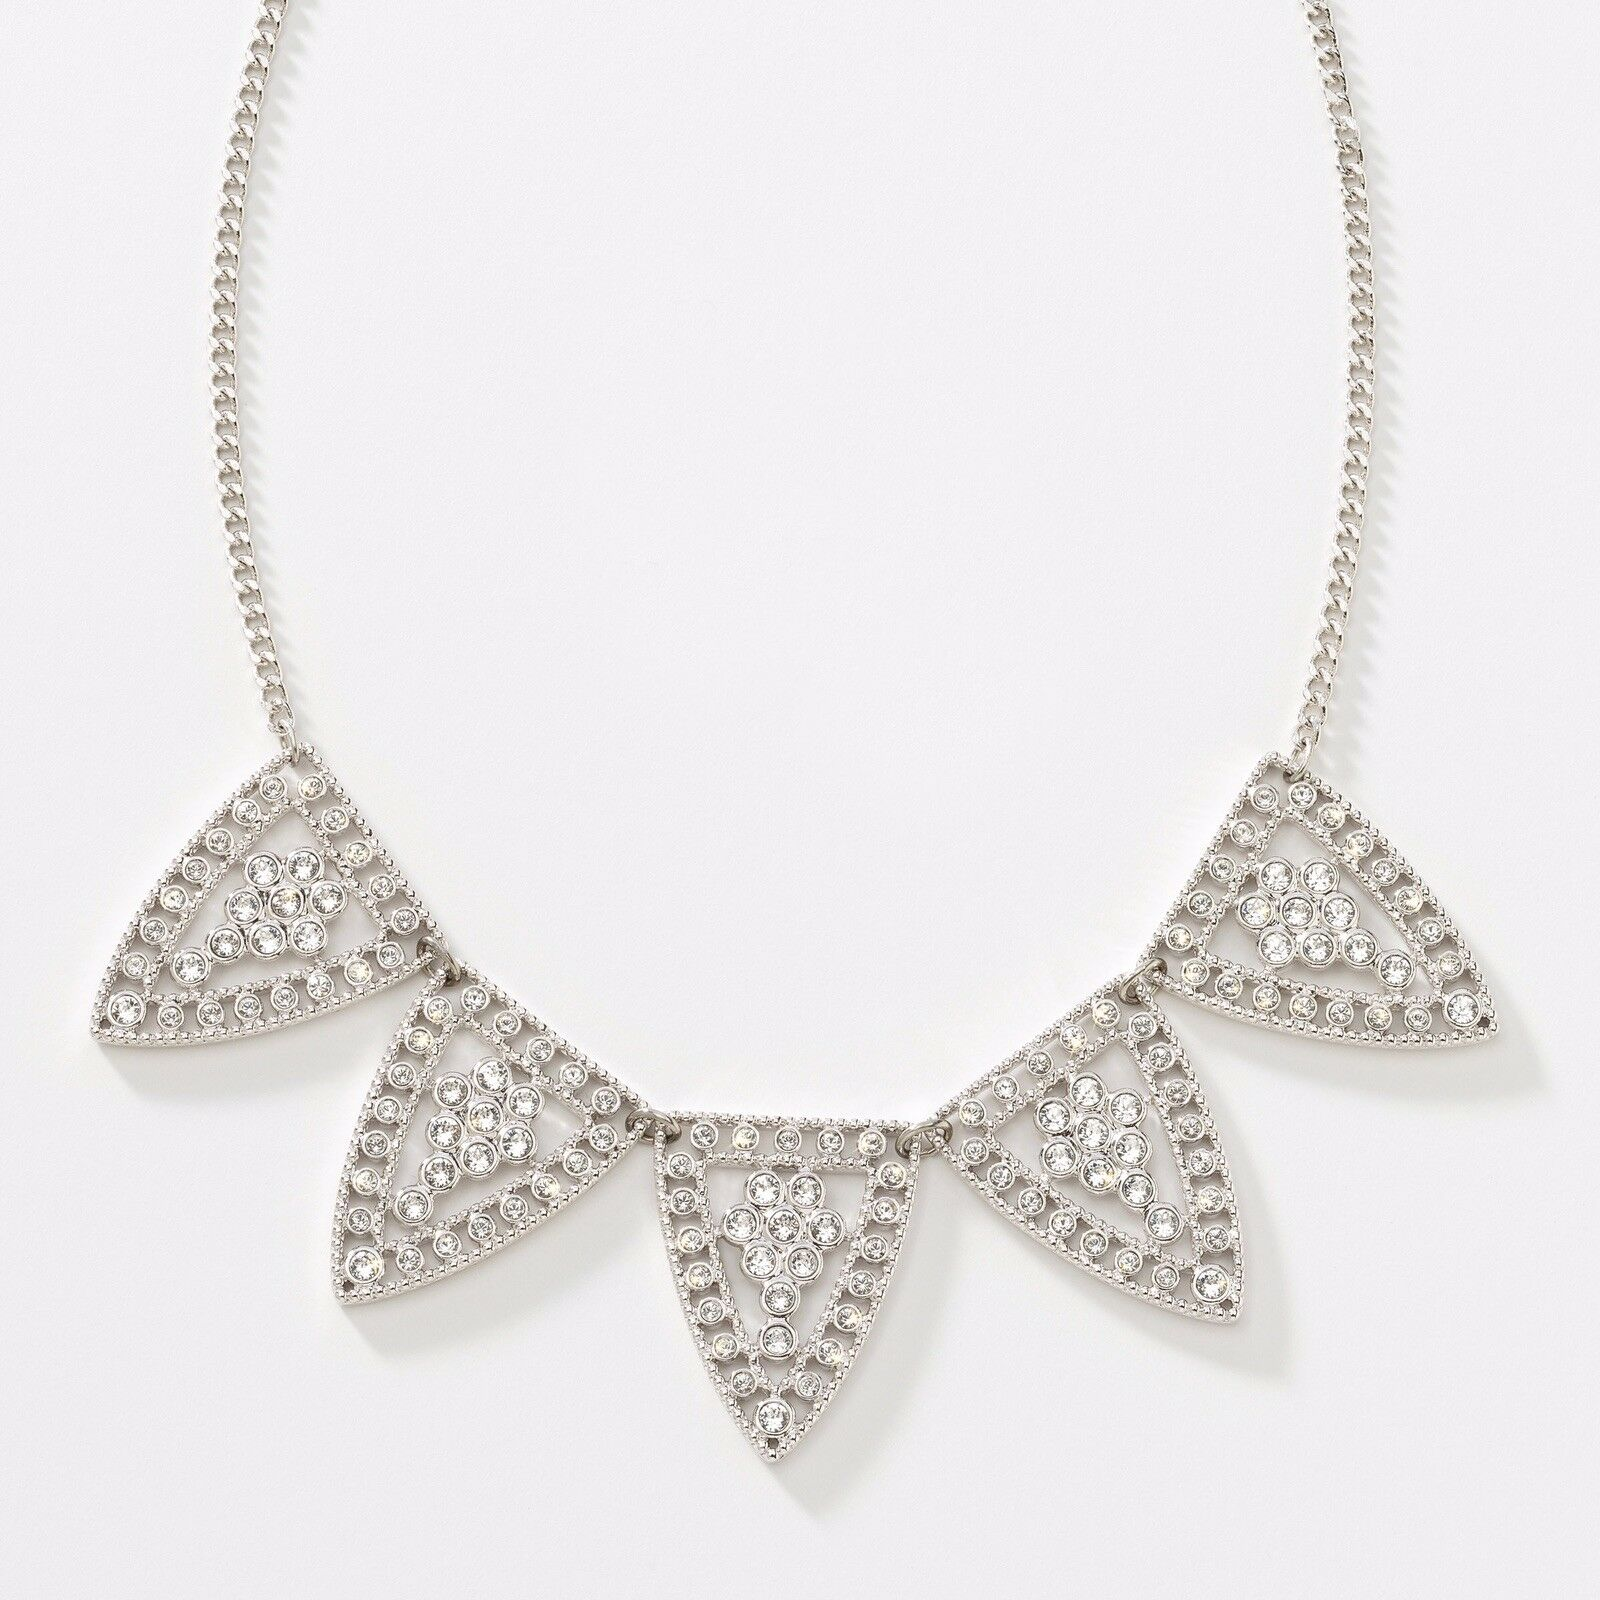 NEW Touchstone Crystal by Swarovski White Crystal Shield Neclace Bridal Jewelry